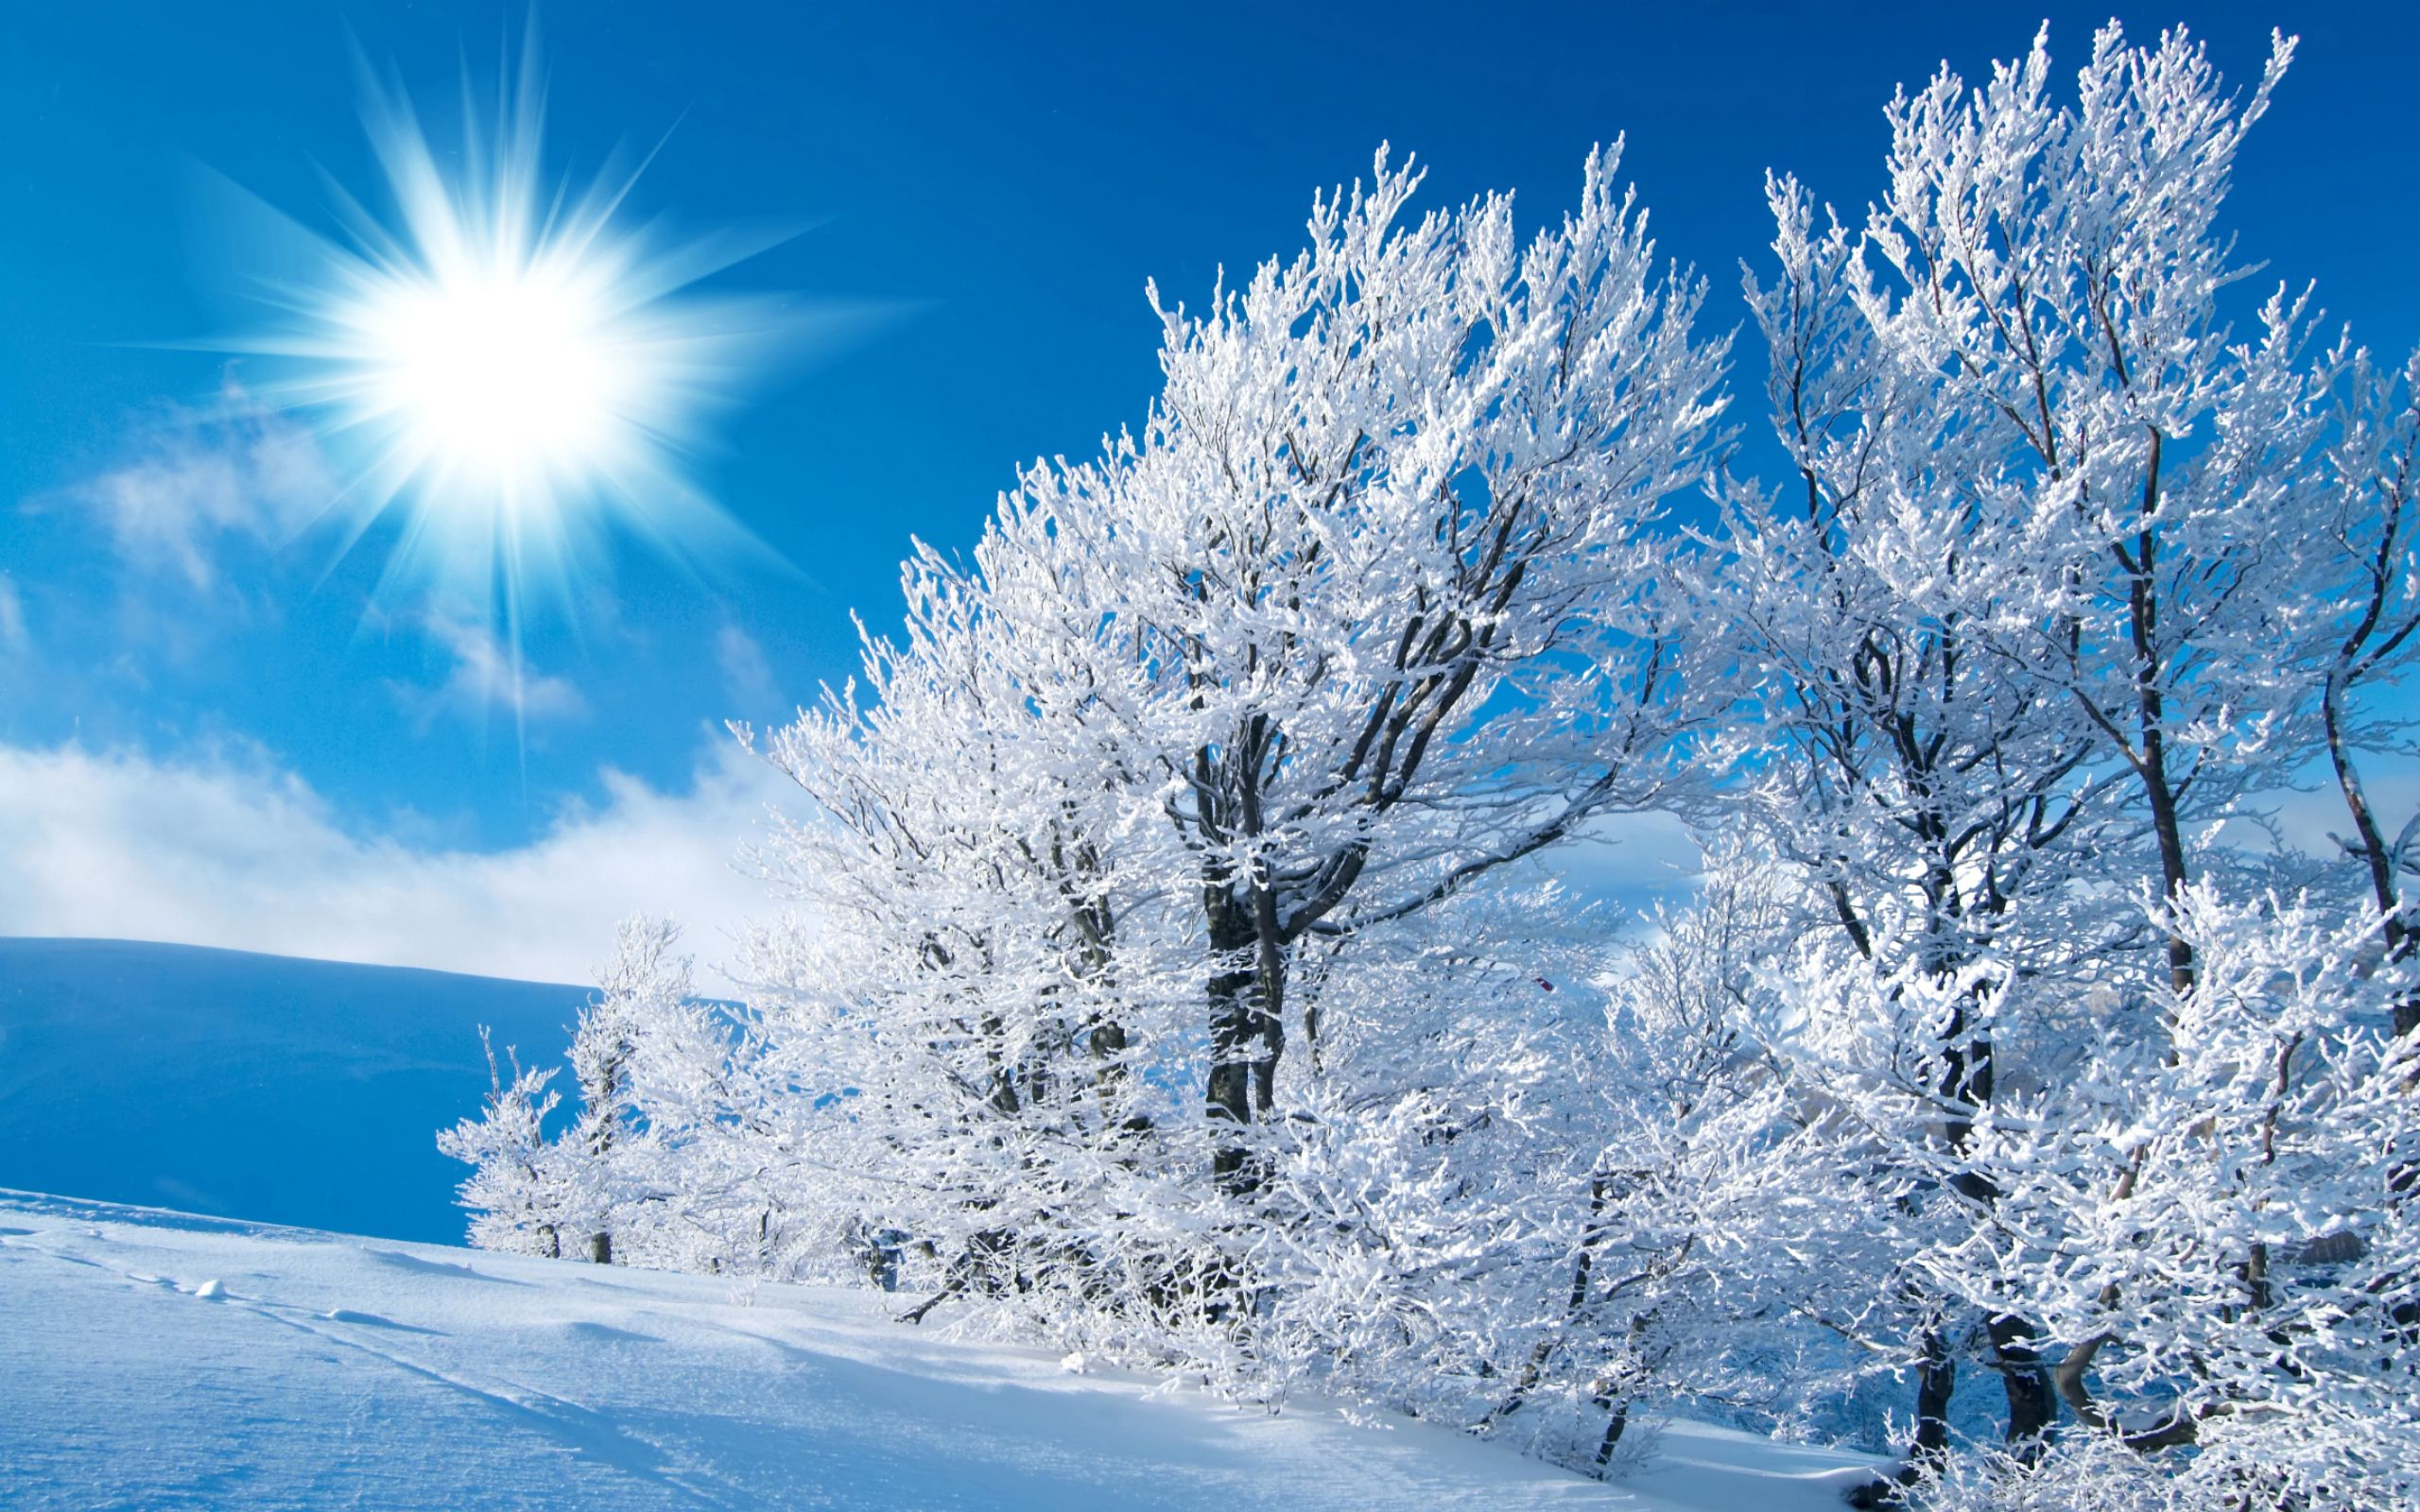 R Sultats Google Recherche D Images Correspondant Http Laguillaumiere Sofeegraphiste Co Landschafts Tapete Hintergrundbilder Winter Hintergrundbilder Natur